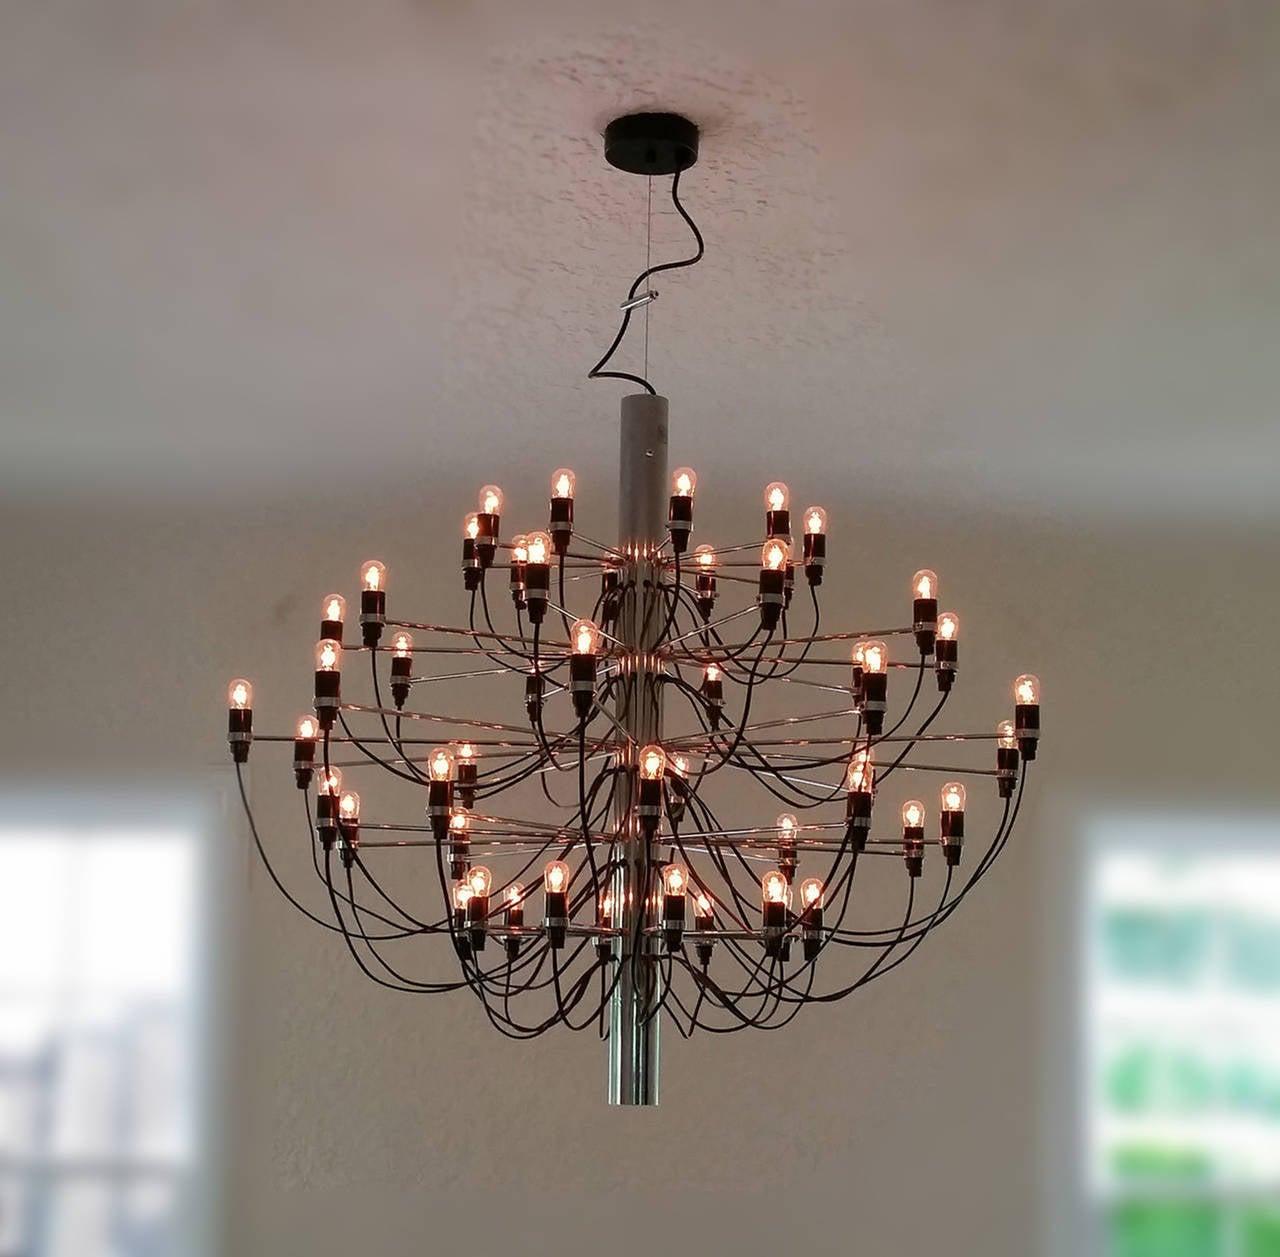 50 bulb gino sarfatti chandelier for sale at 1stdibs for Gino sarfatti flos